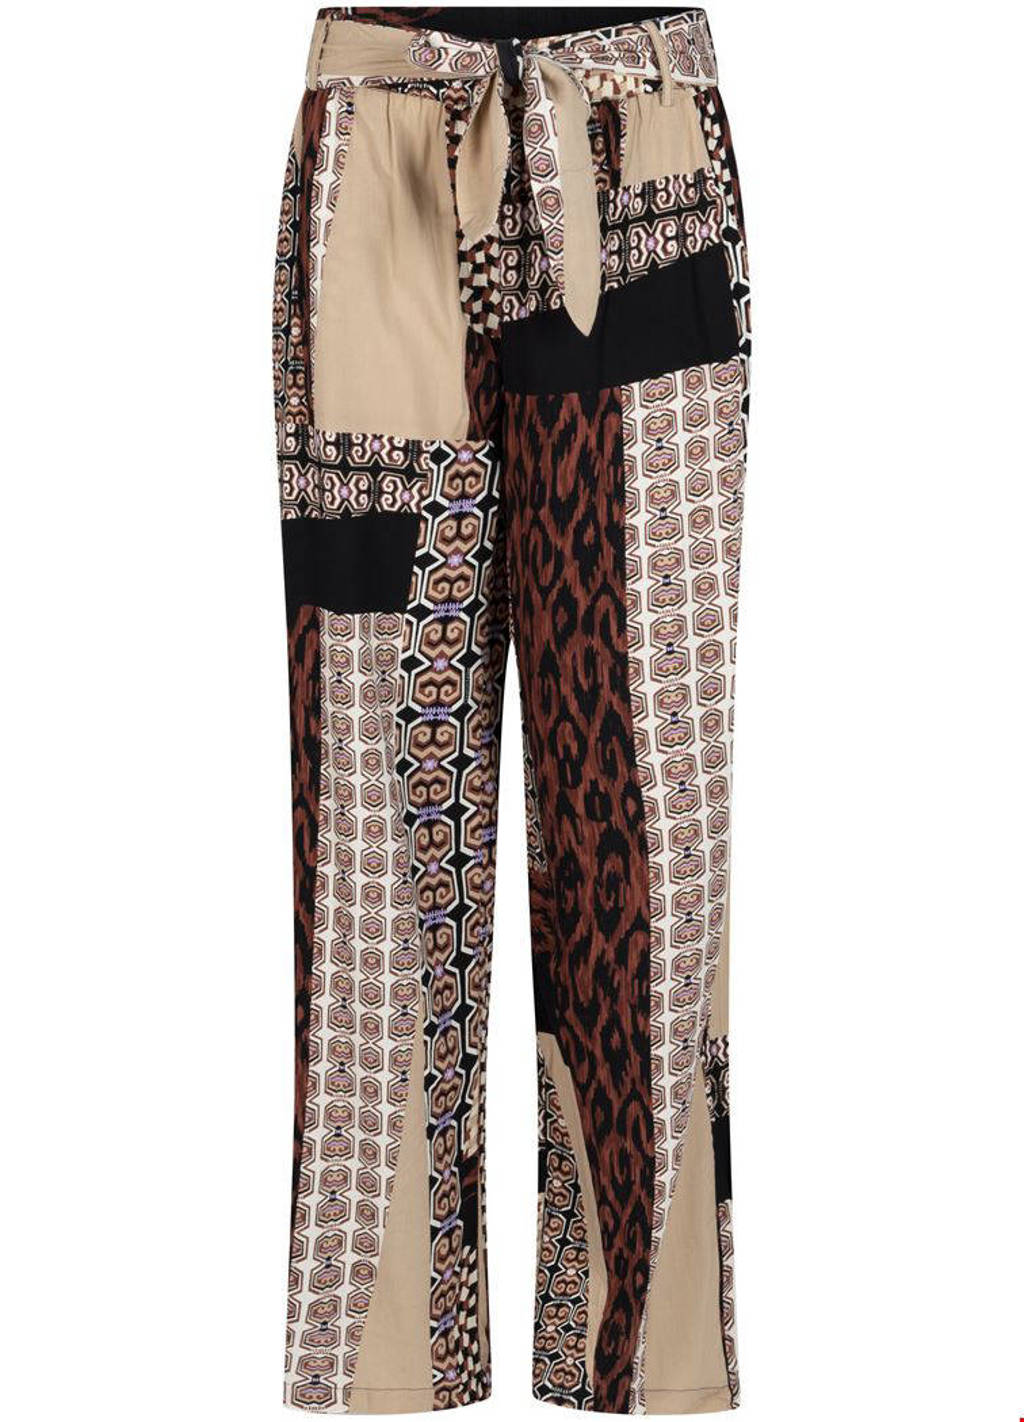 Tramontana high waist loose fit broek met all over print bruin, Bruin